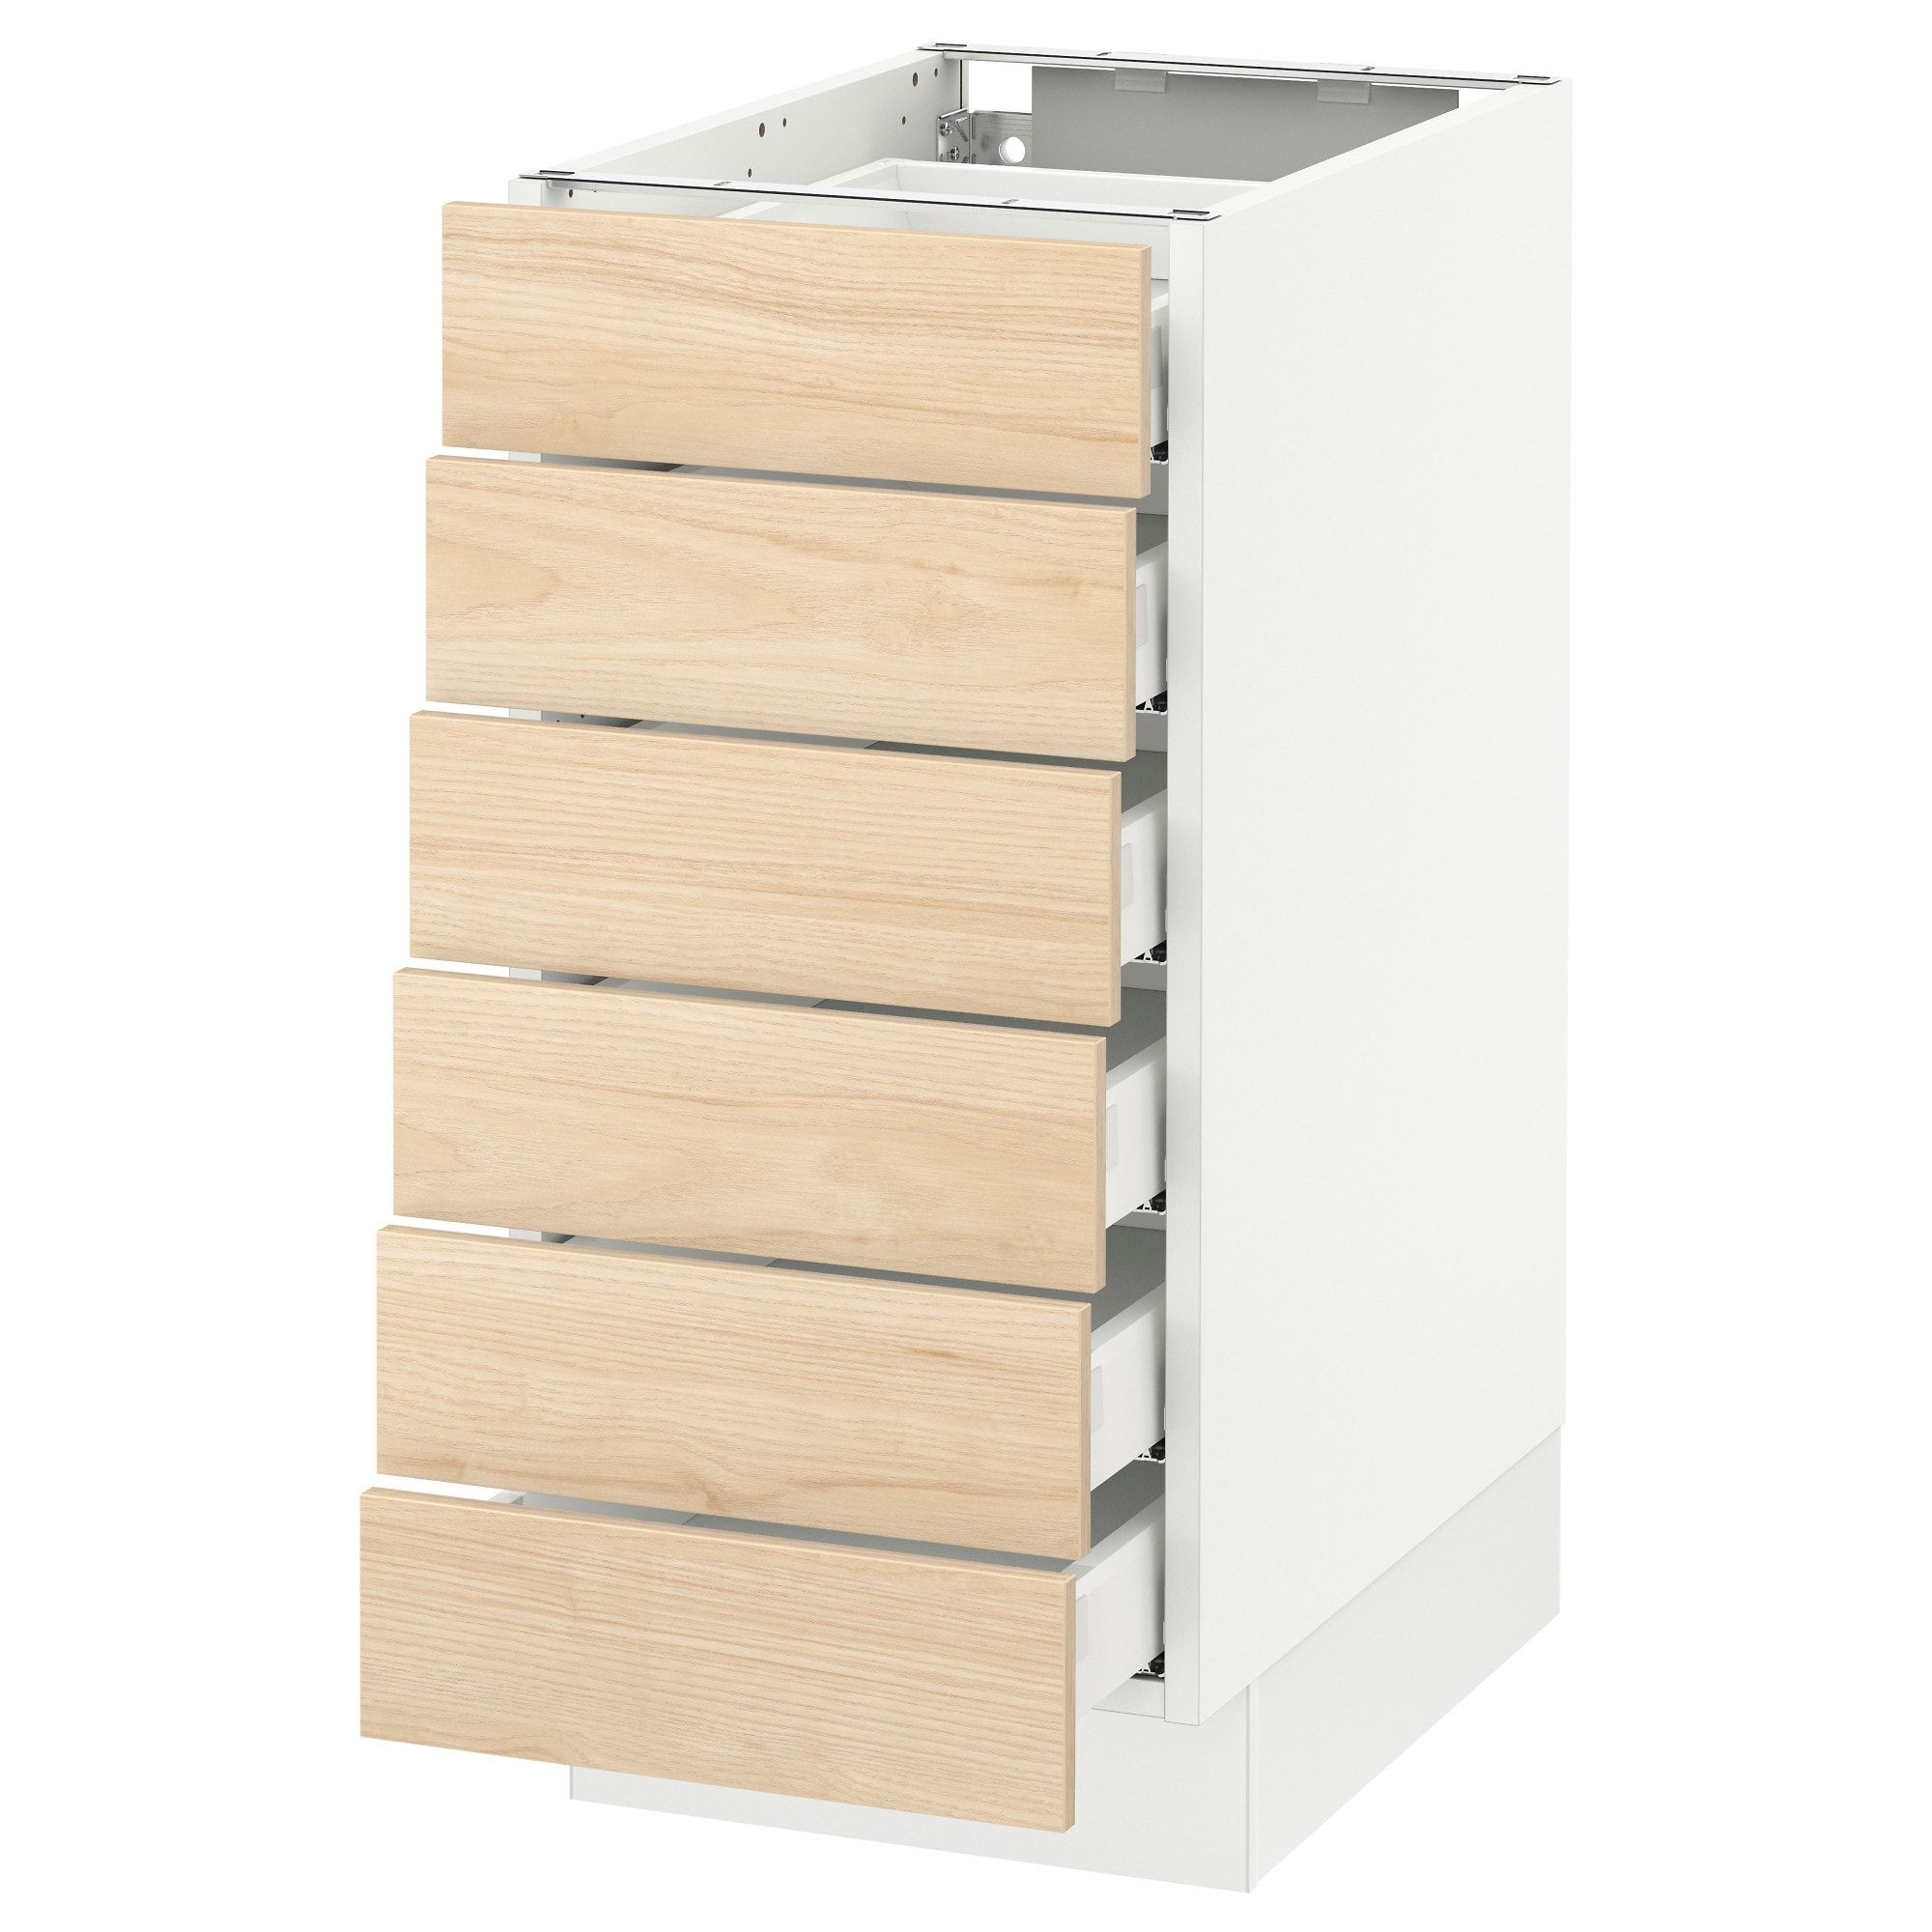 Sektion Base Cabinet 6 Fronts 6 Low Drawers White Maximera Askersund Ash Light Ash Effect 15x24x30 Ikea Base Cabinets Ikea Sektion Ikea